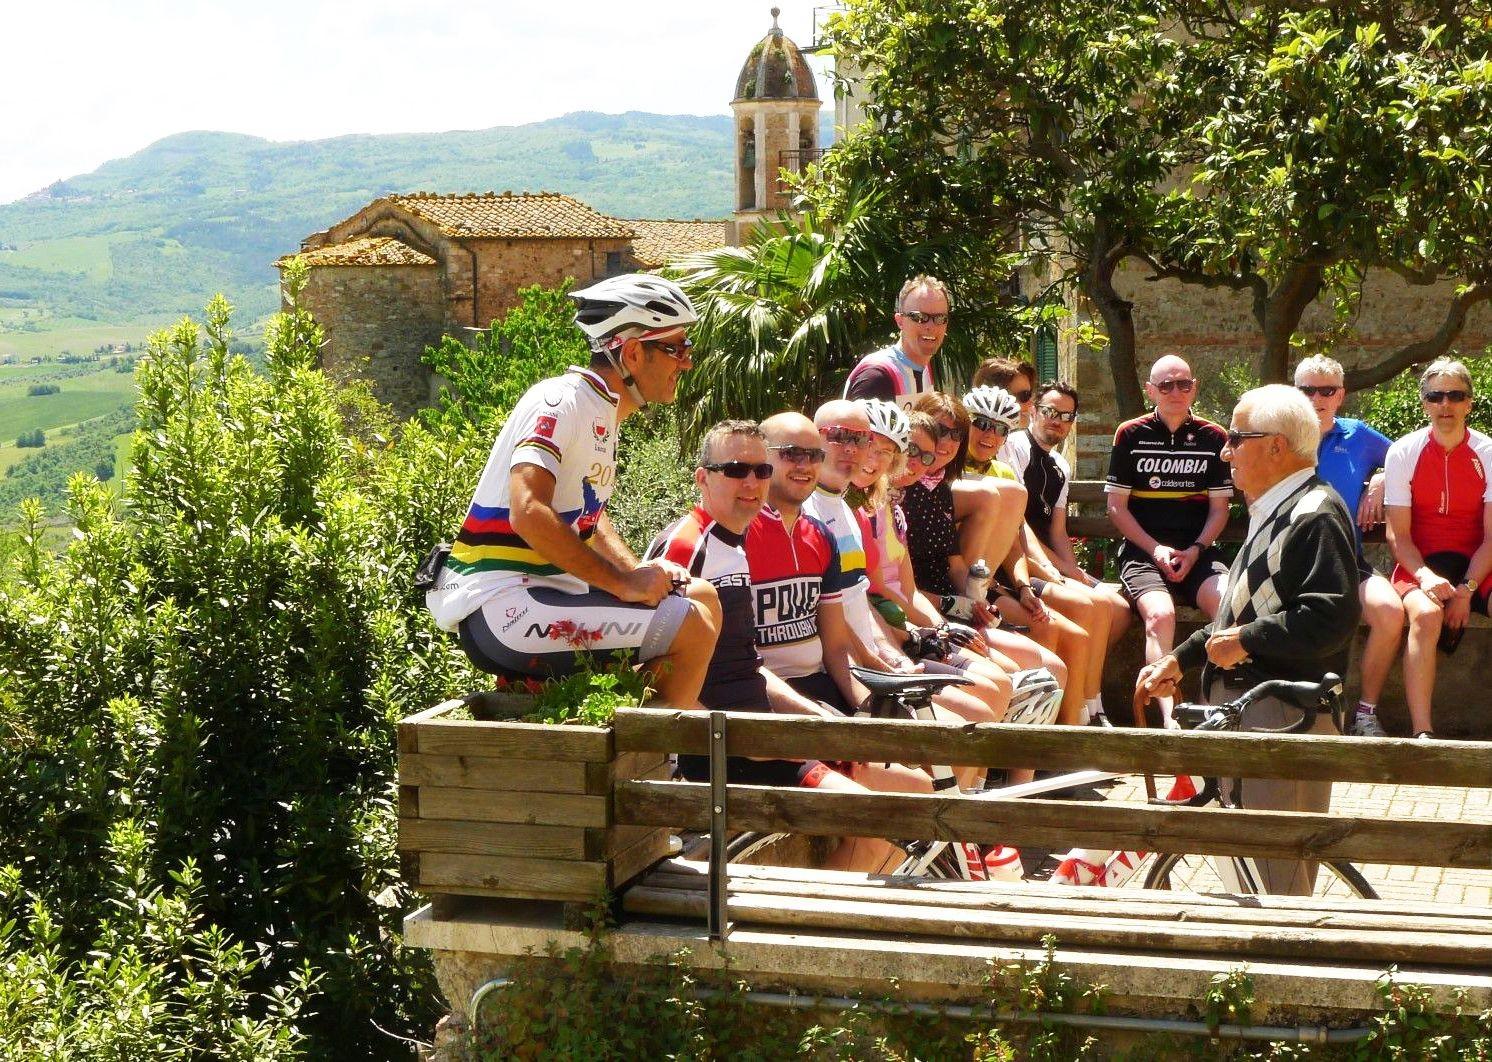 guided-group-cycling-holiday-tuscany-italy.jpg - Italy - Tuscany Tourer - Guided Road Cycling Holiday - Italia Road Cycling